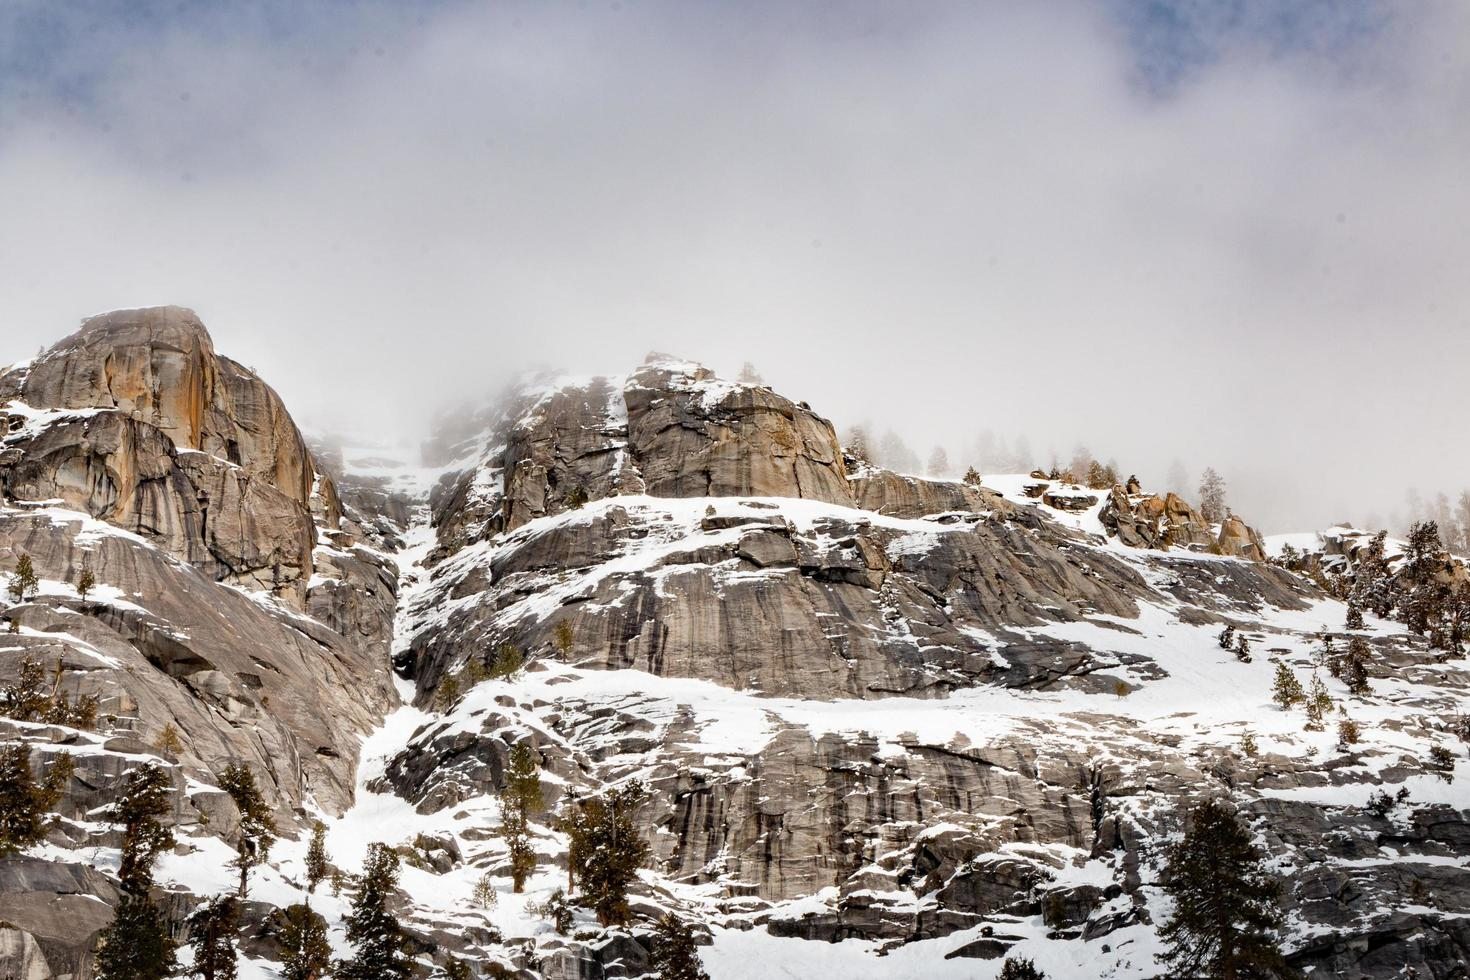 Snowy mountain range during winter photo